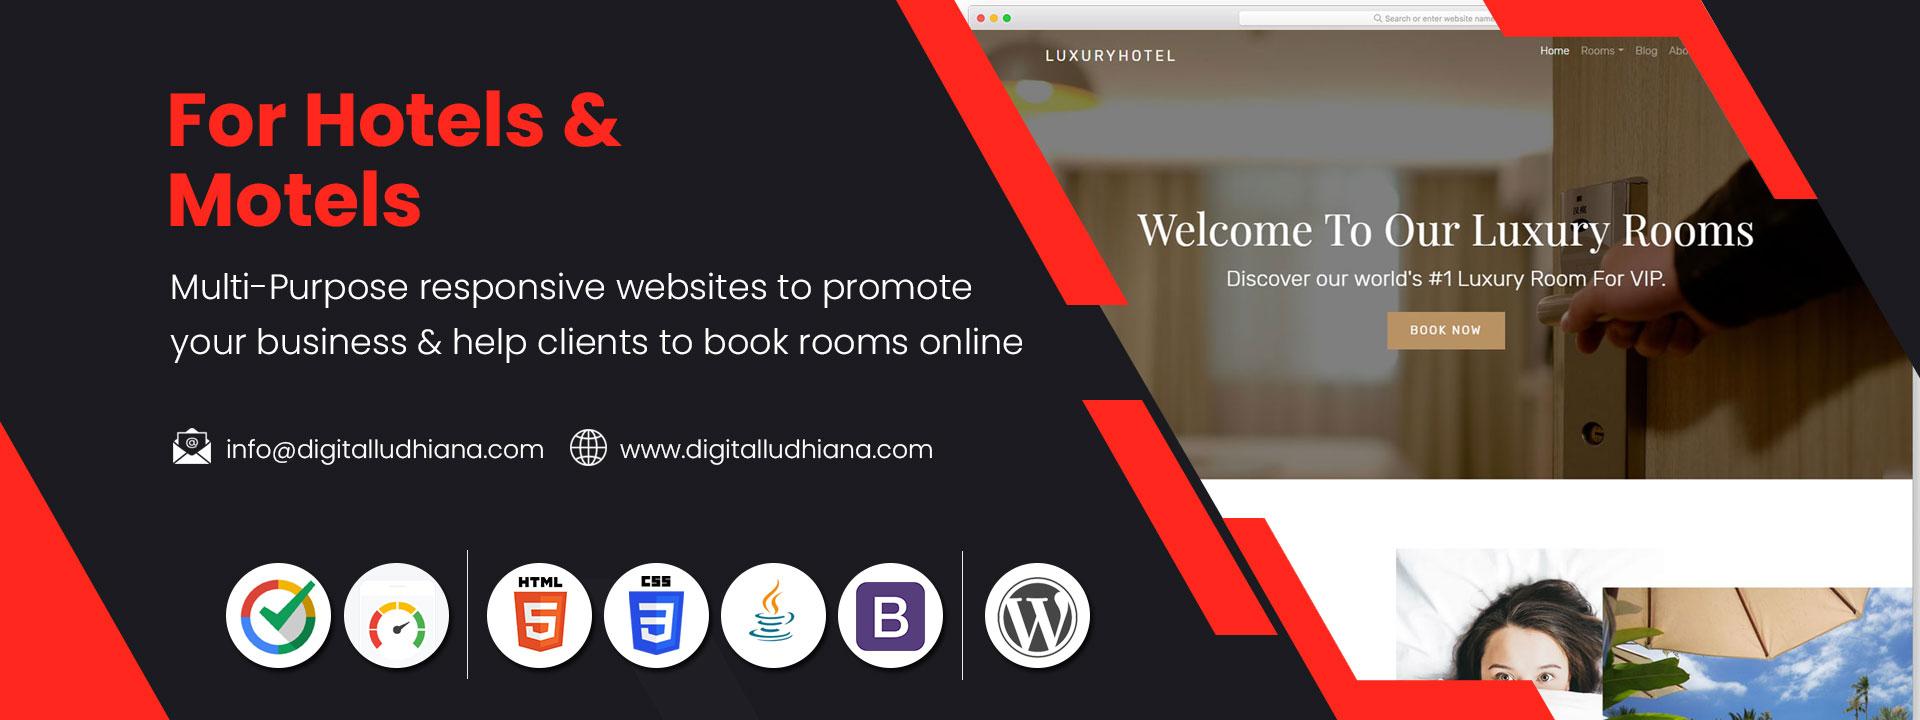 hotel motel website designing company in ludhiana punjab india